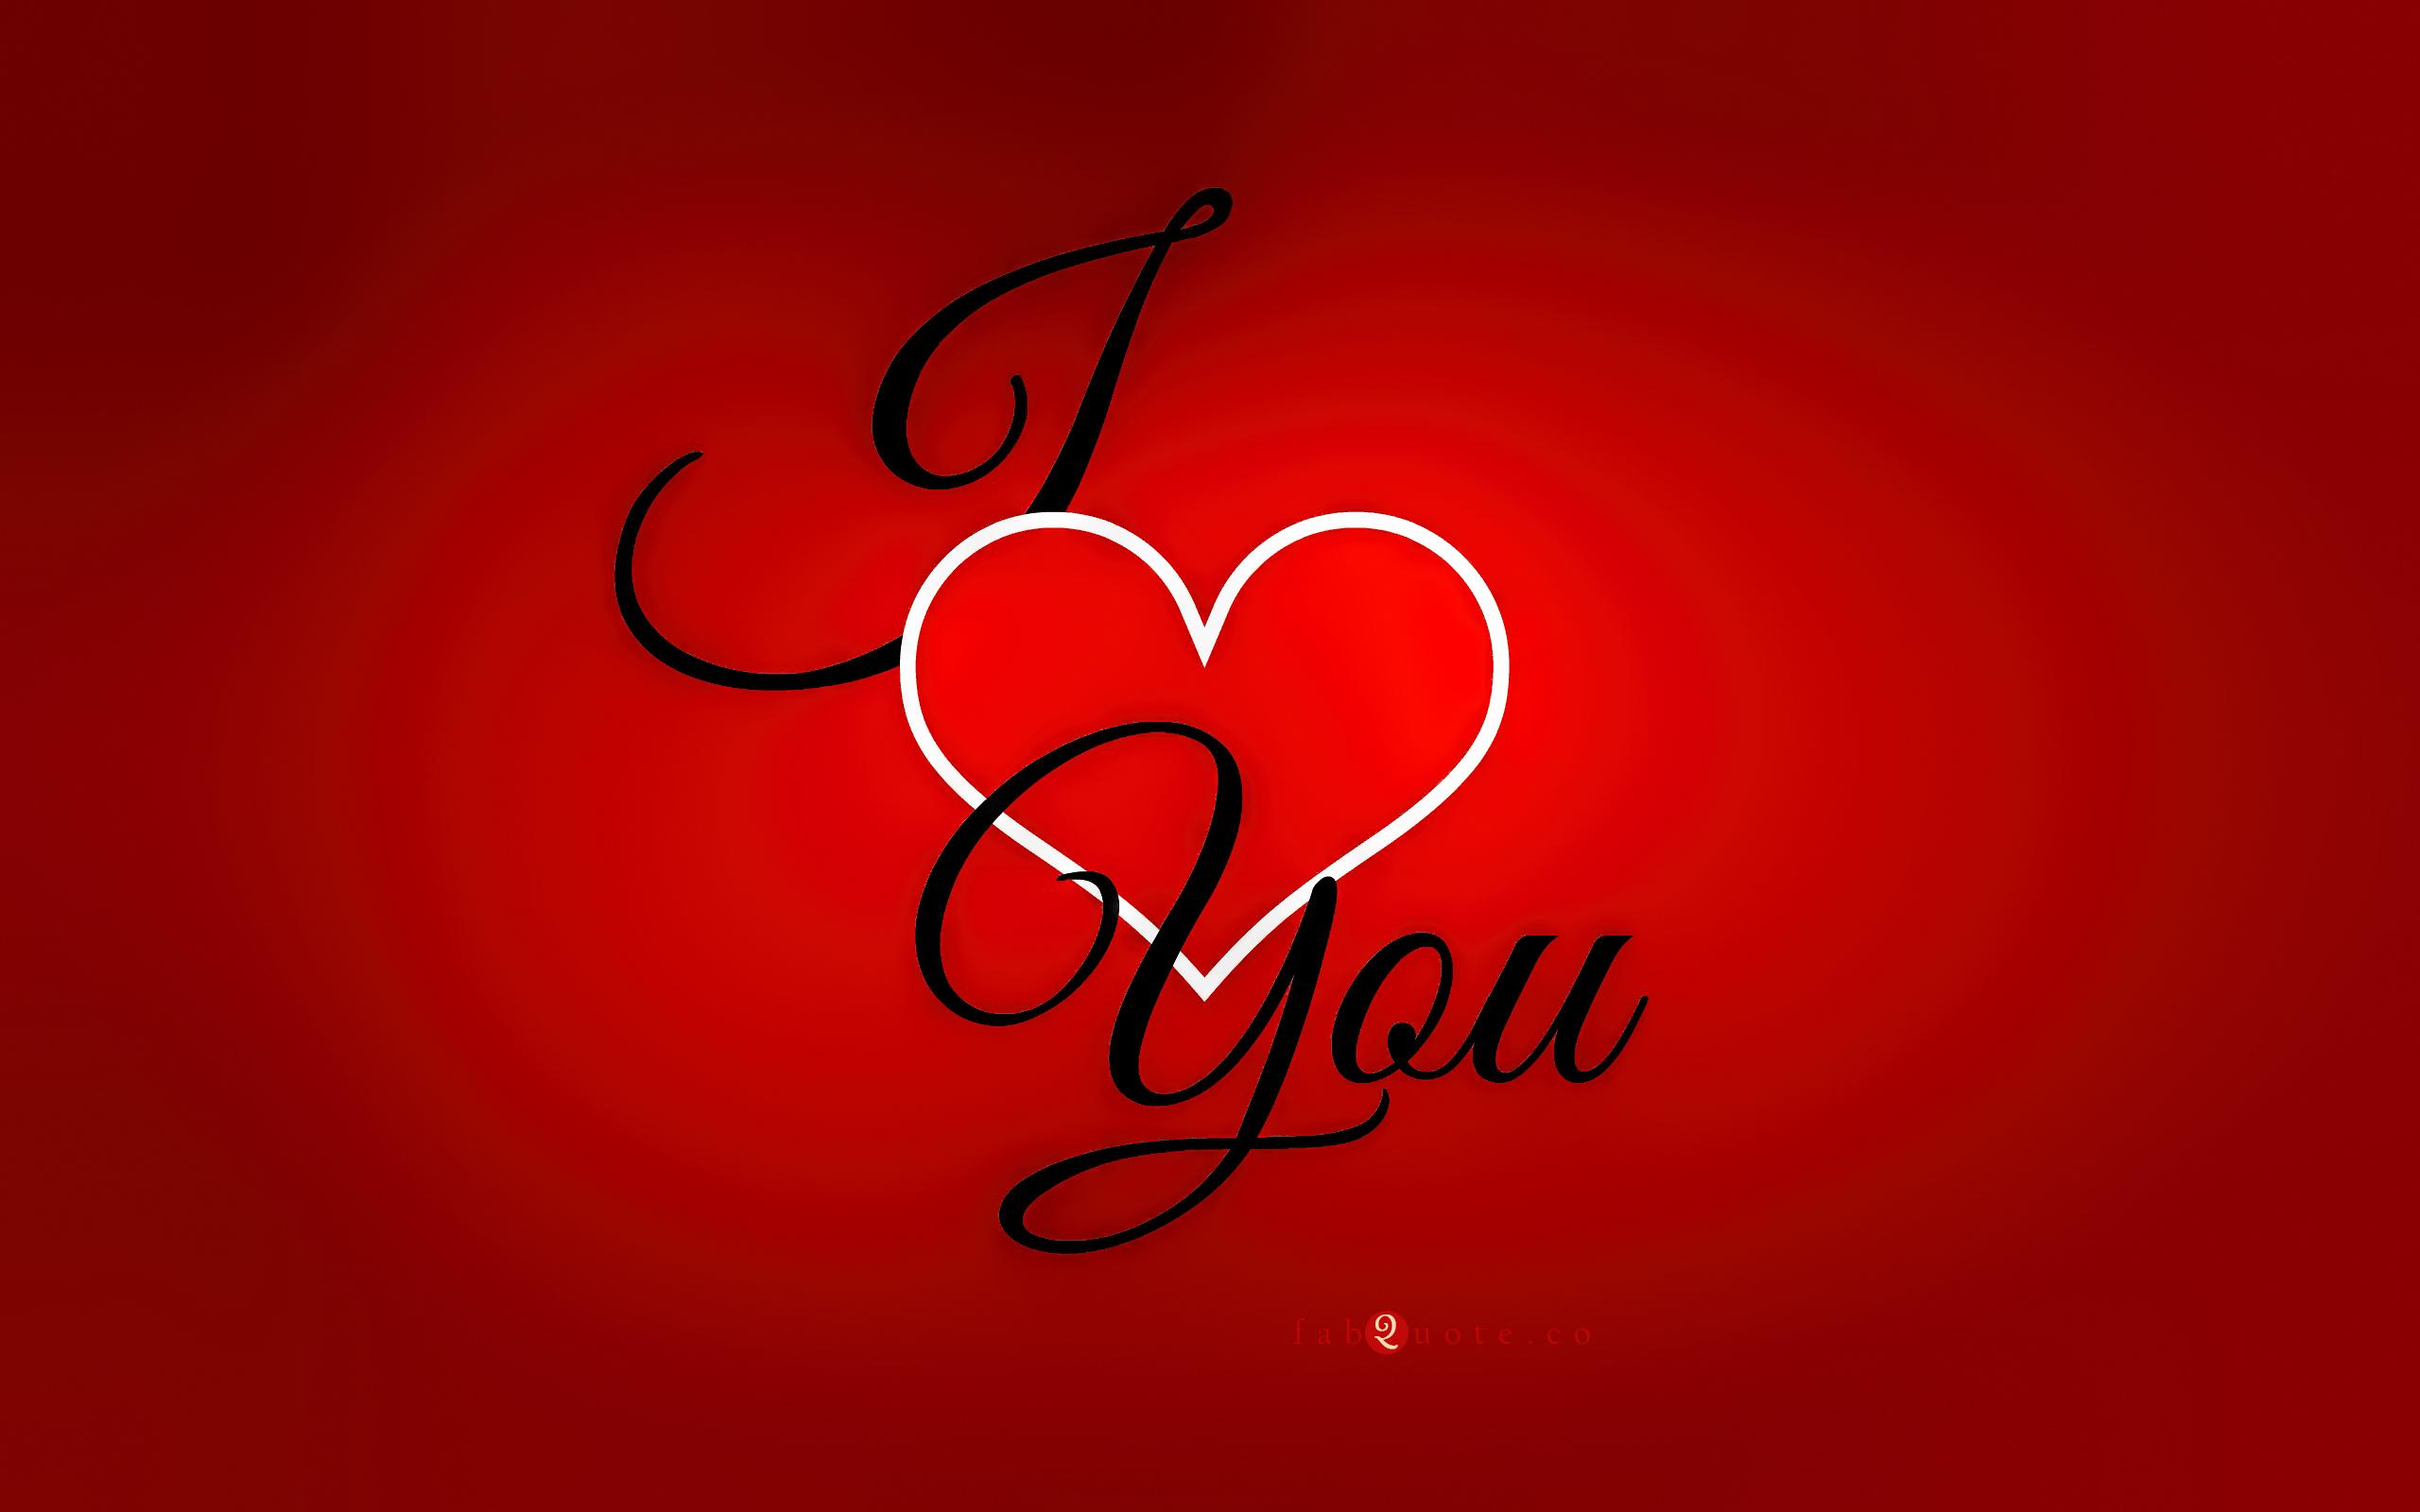 Top 10 Best Valentine's Day Gifts Ideas For Boyfriend And Girlfriend